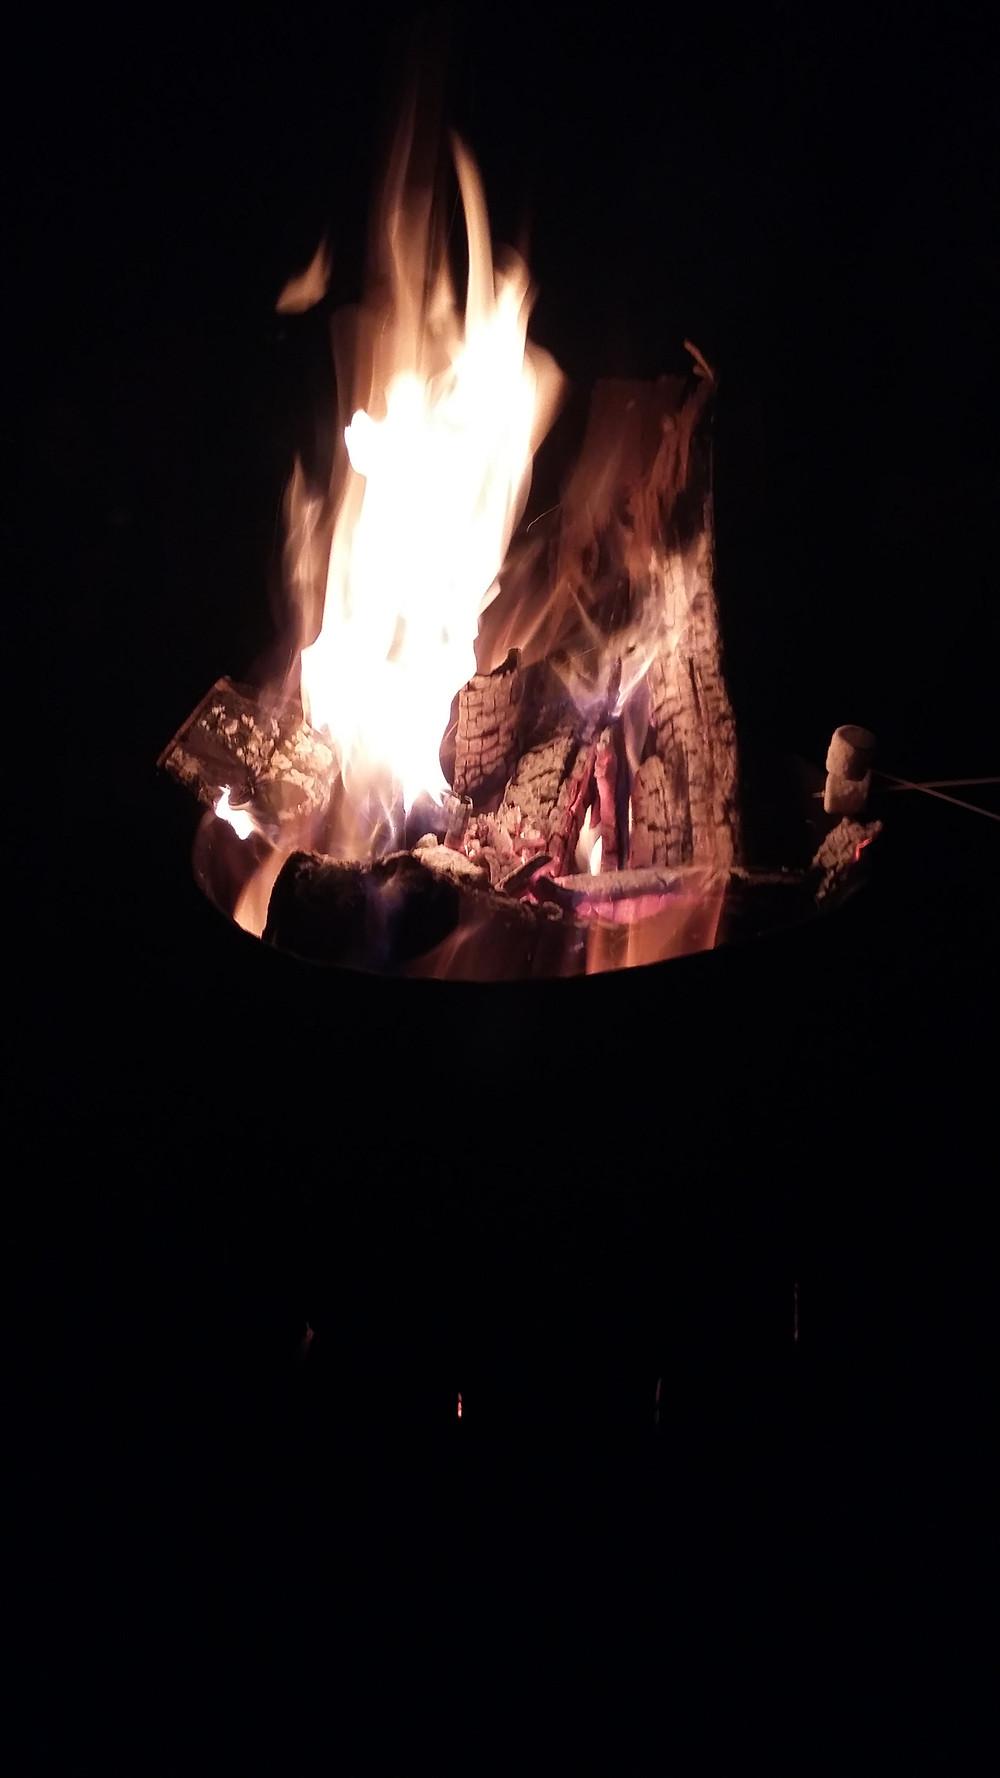 mashmallow party at bivouac semnoz